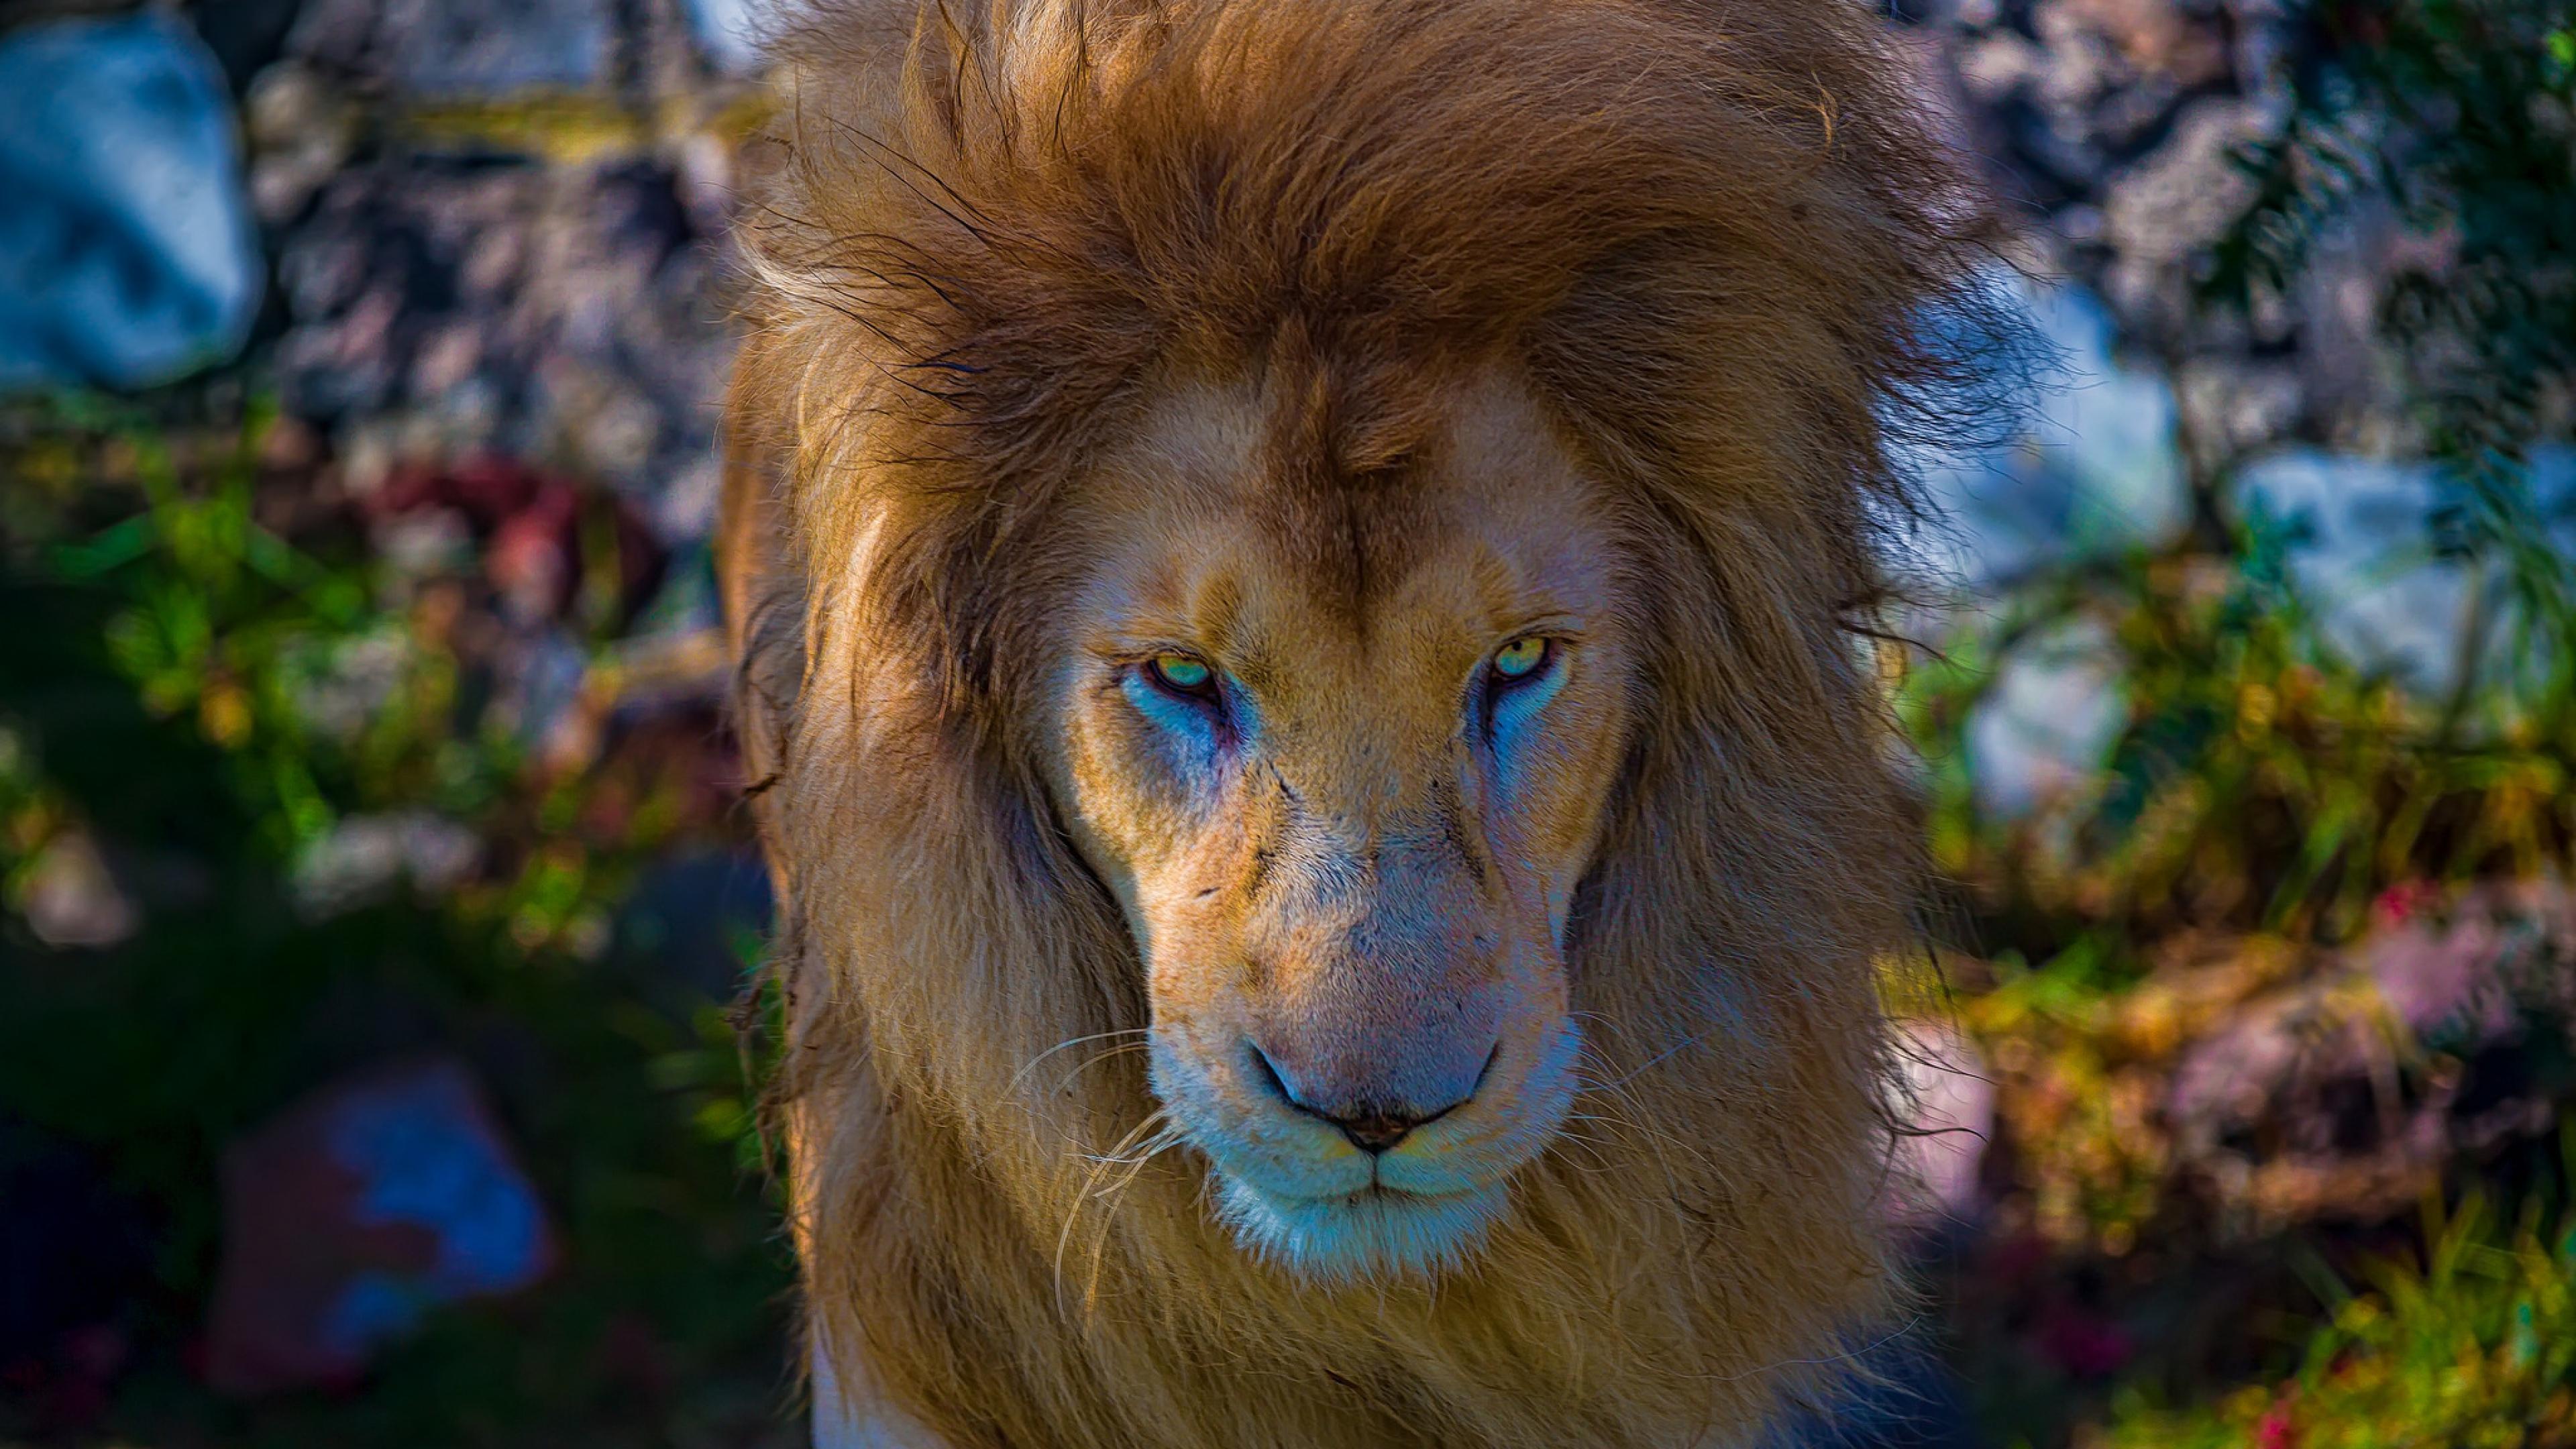 2048x2048 Playerunknowns Battlegrounds 1080p Ipad Air Hd: 2048x2048 Lion Predator Ipad Air HD 4k Wallpapers, Images